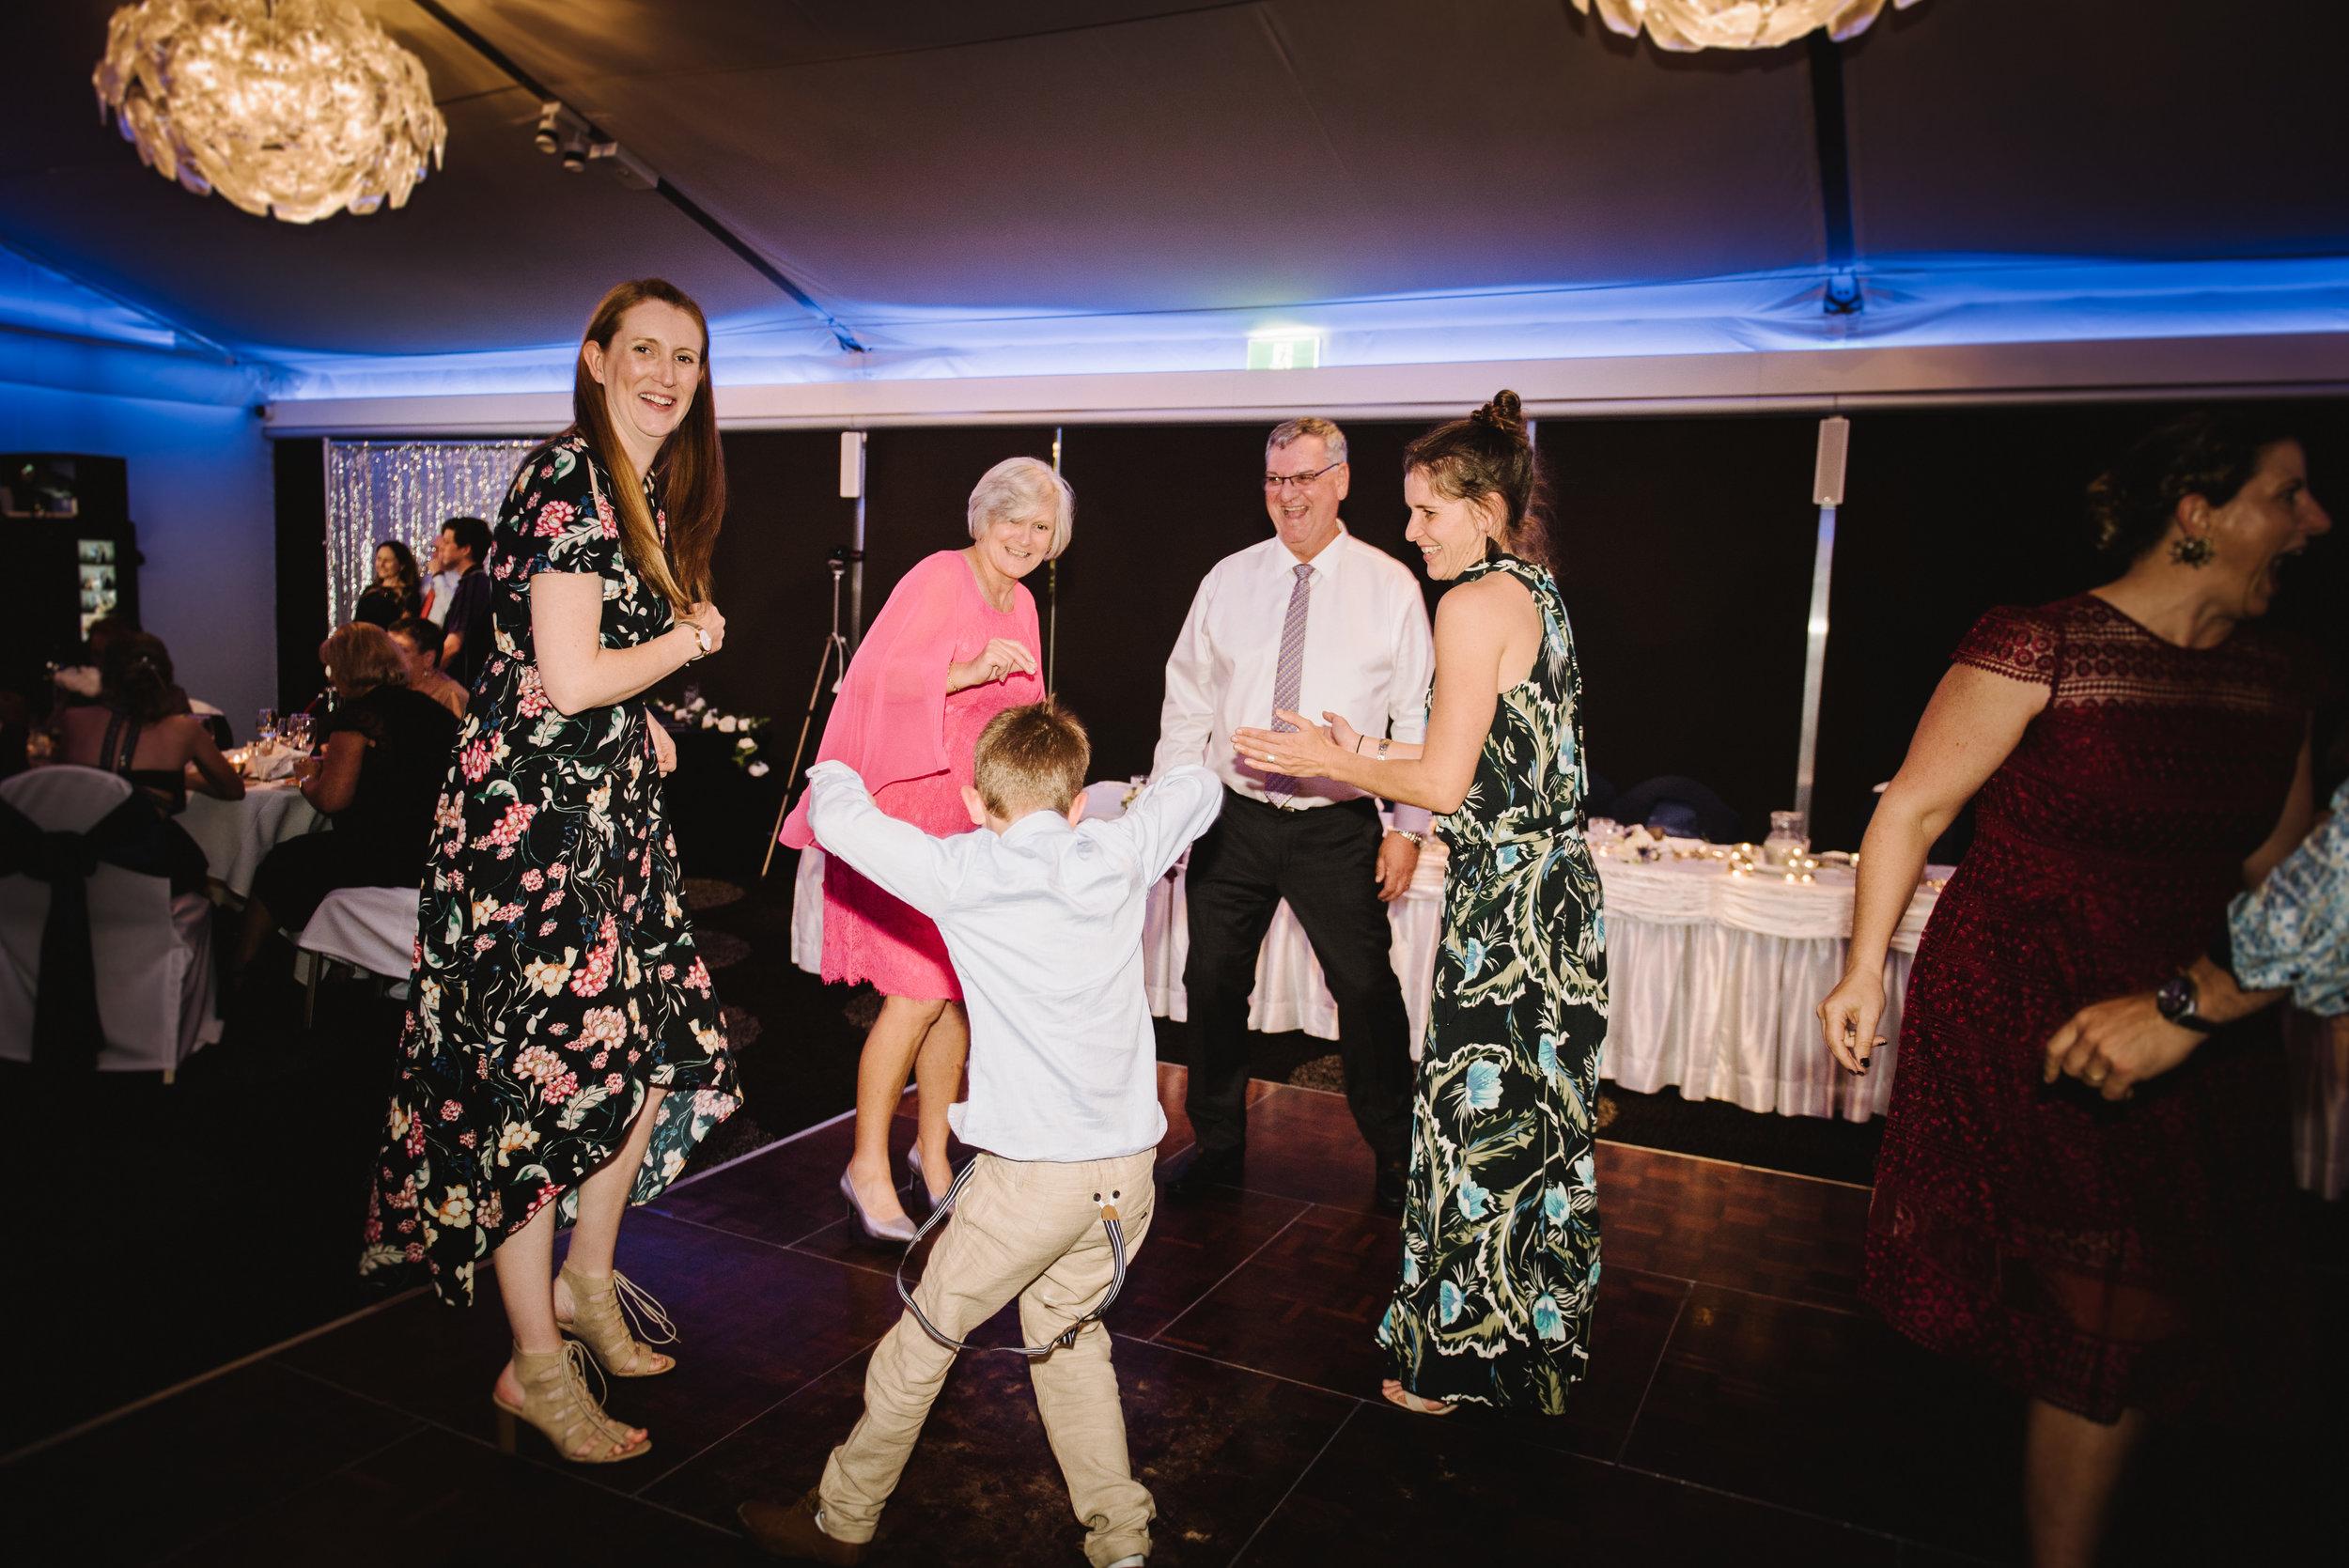 brisbane-wedding-photographer-136.jpg